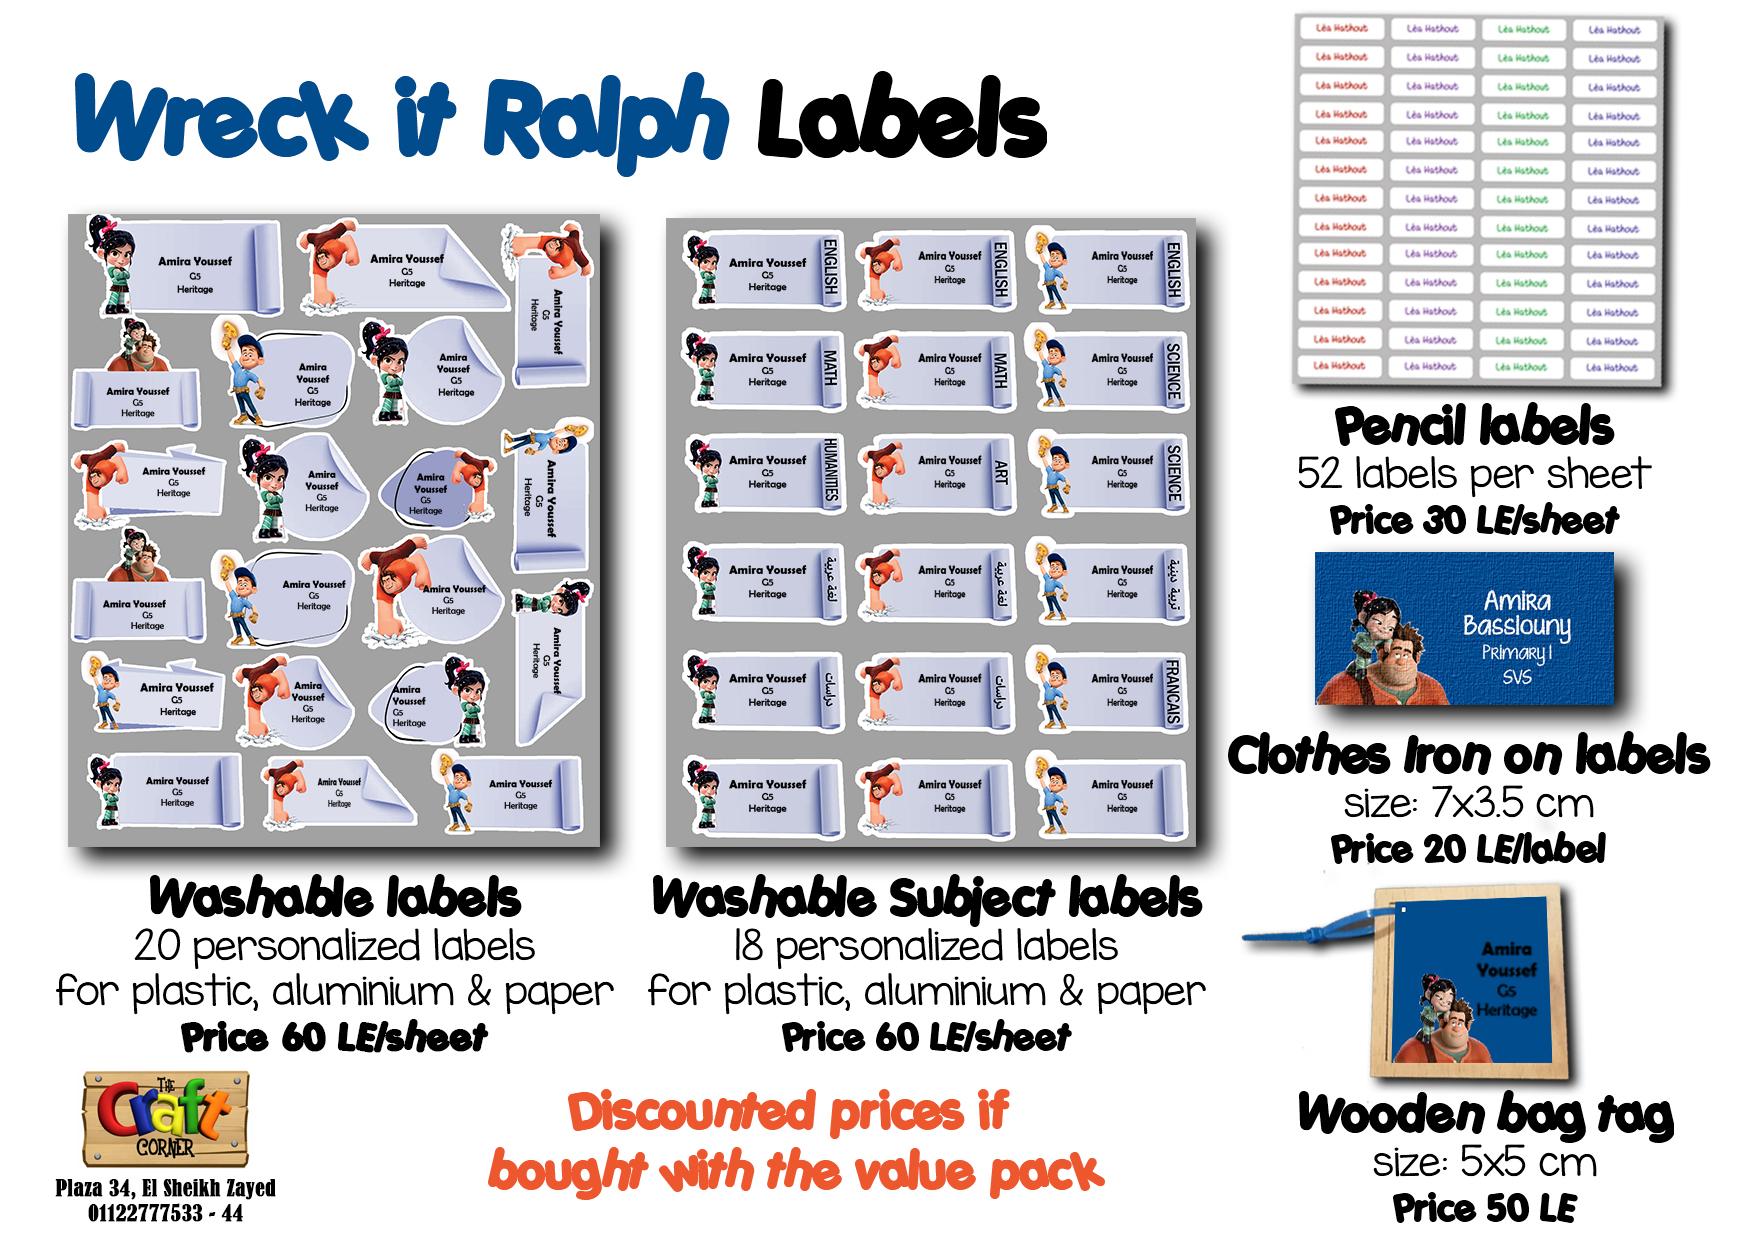 wreck it ralph Labels